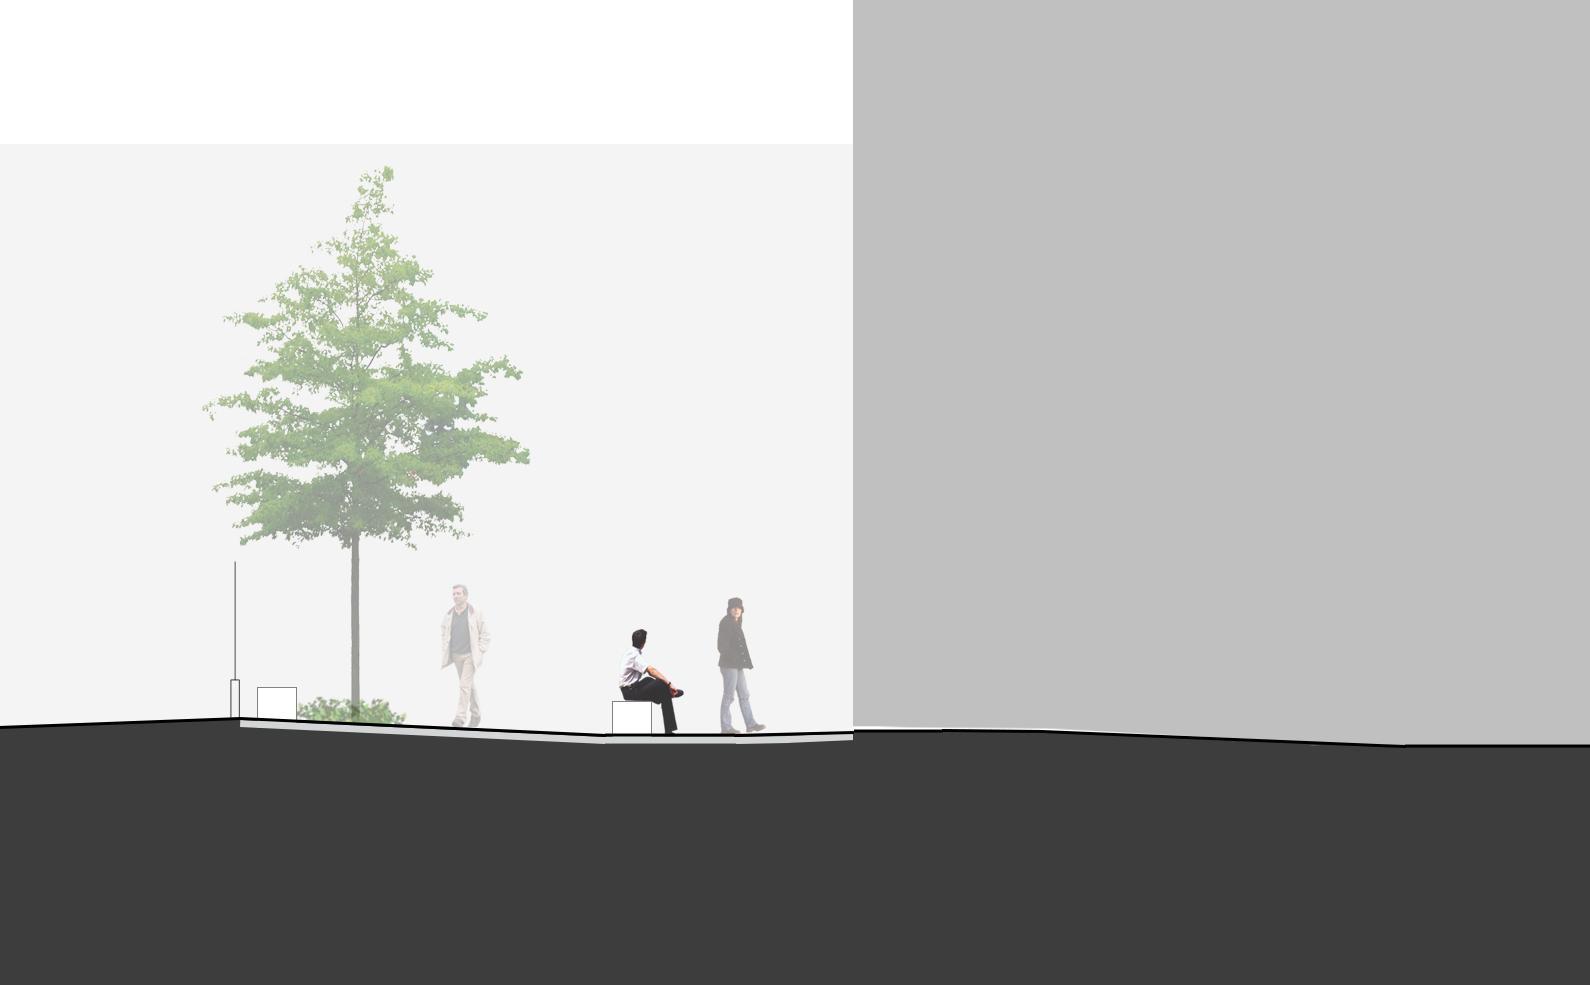 lycée_gabriel_péri_champigny_sur_marne_public_outdoor_design_christophe_gautrand_paysagiste_4.jpg